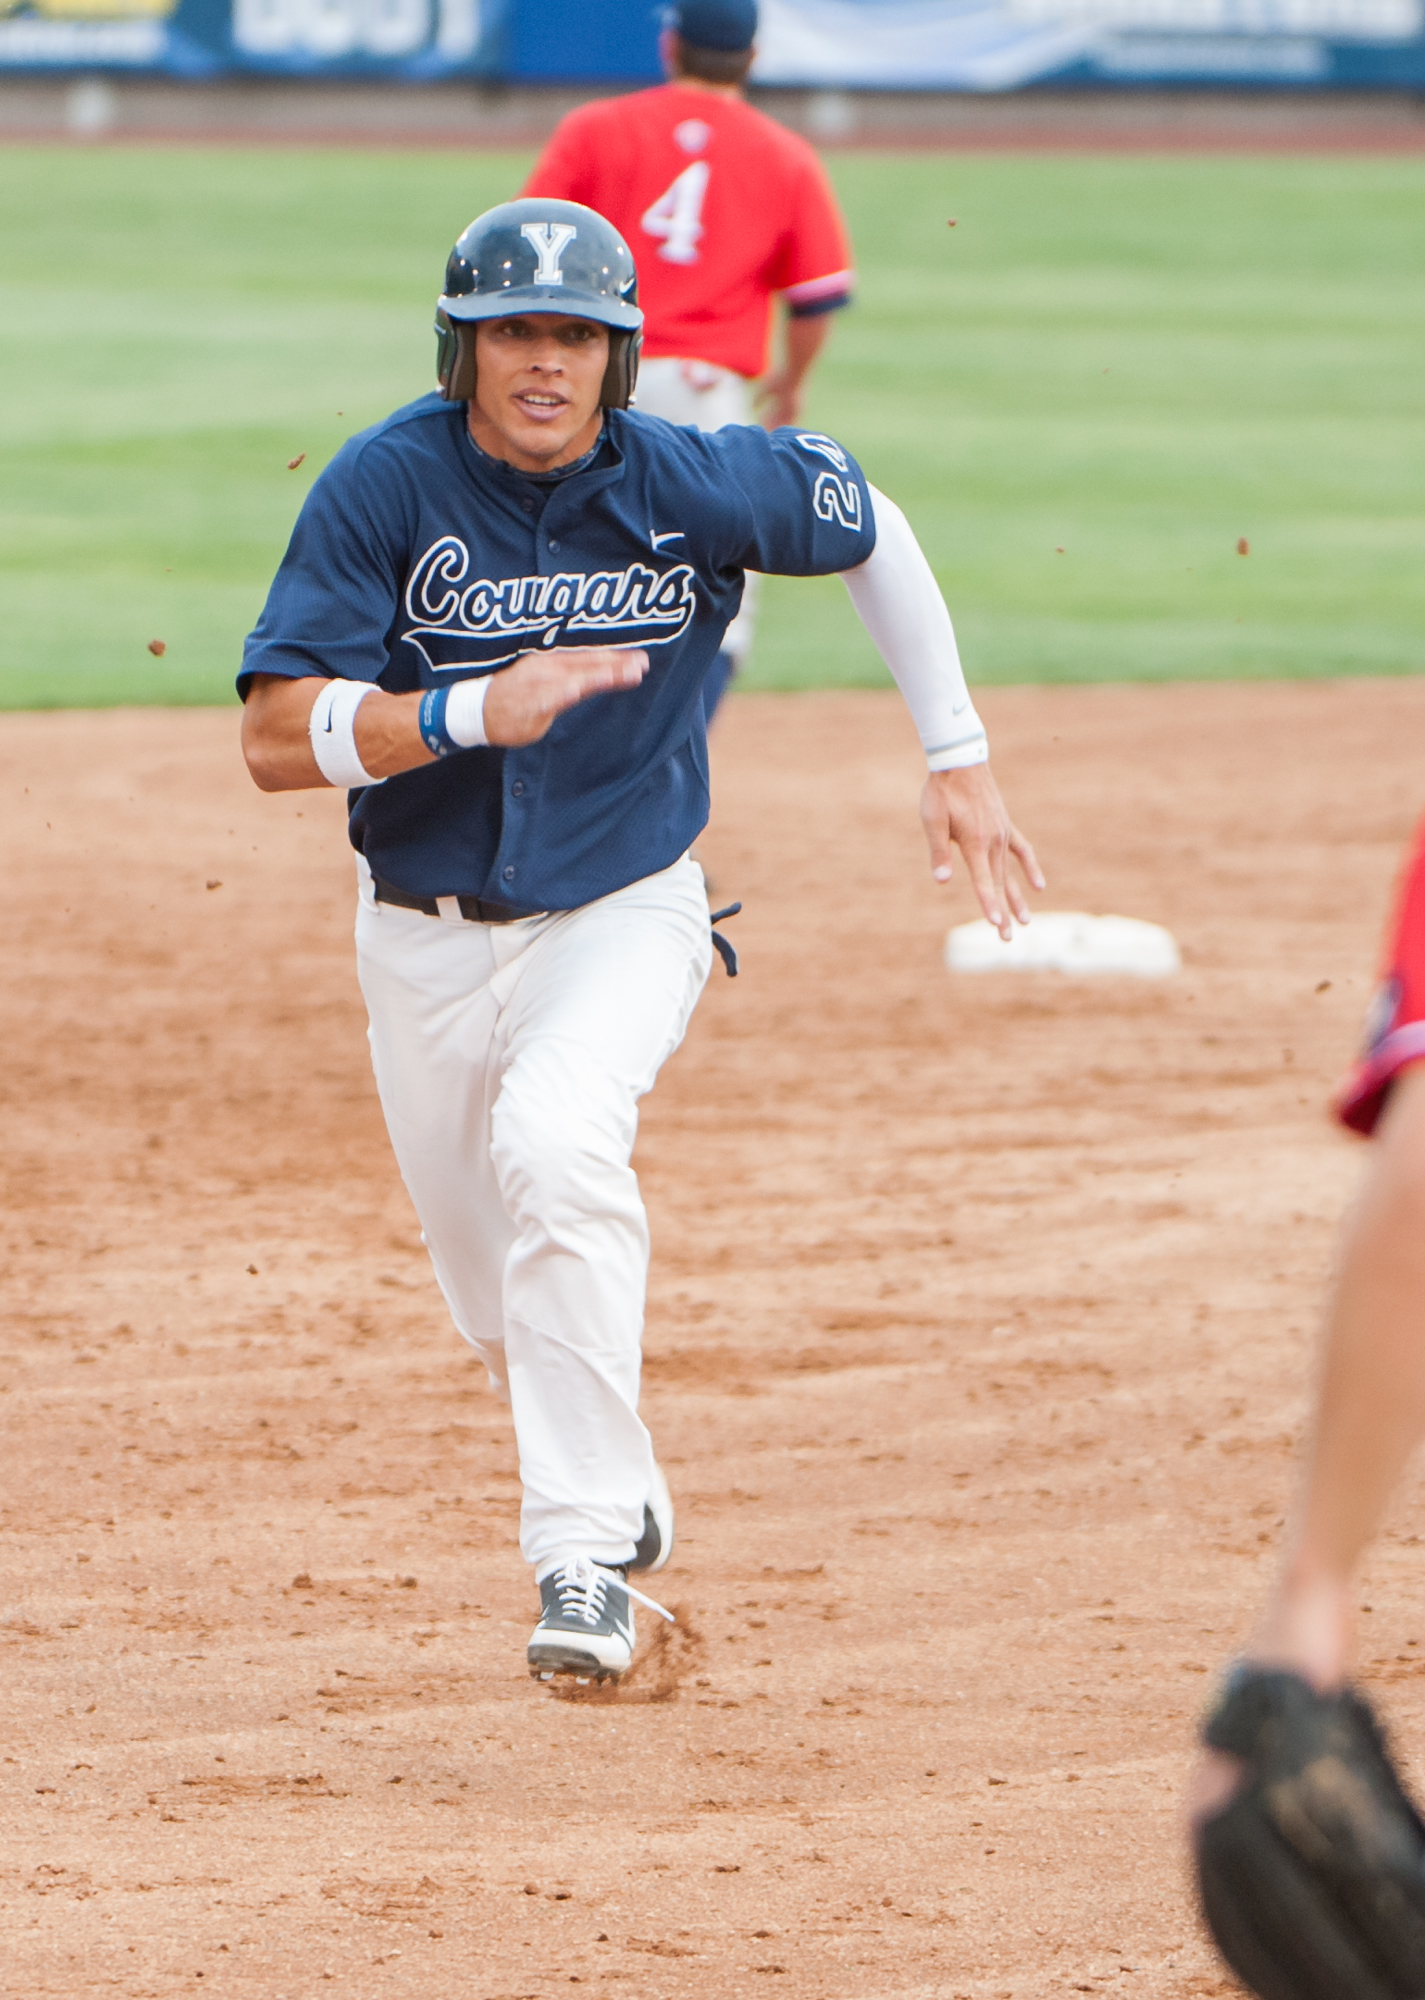 BYU outfielder Jacob Hanneman runs to third base in a game against Gonzaga. (Photo by Elliot Miller)